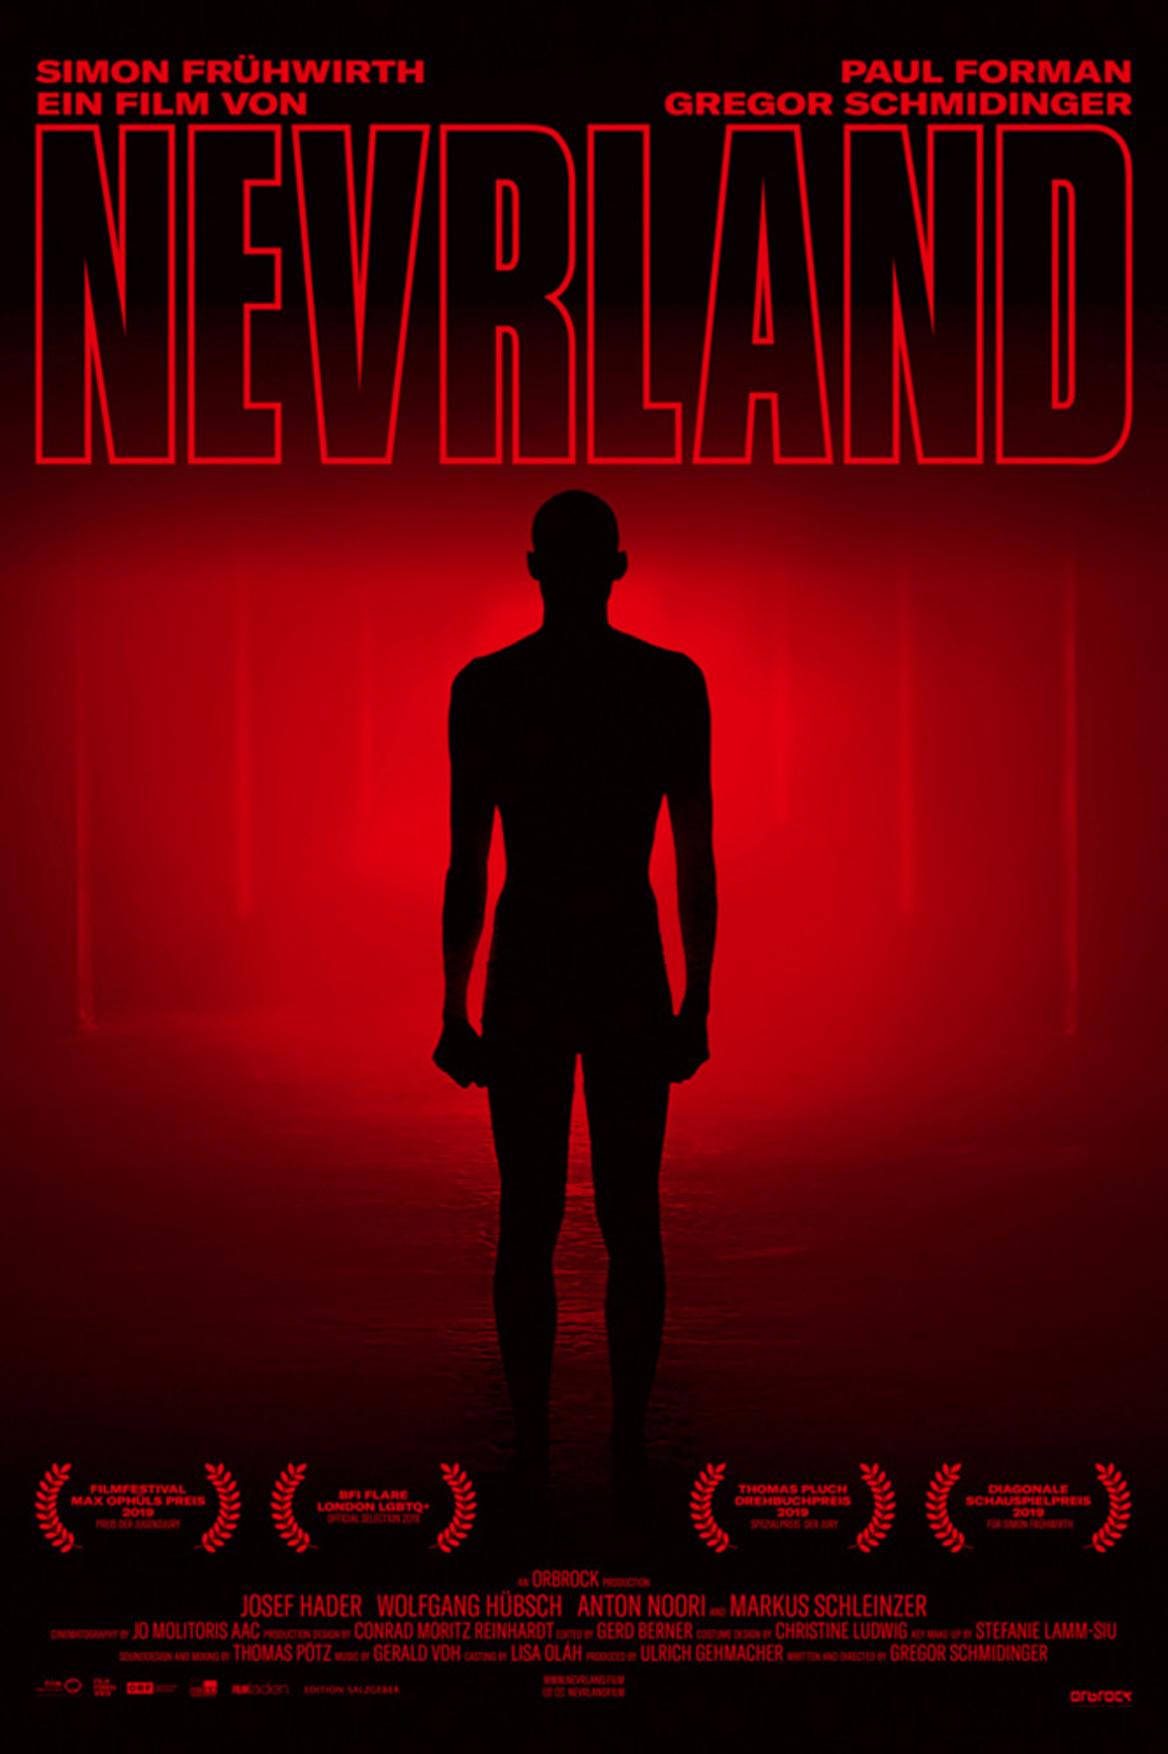 (c) Nevrland.at